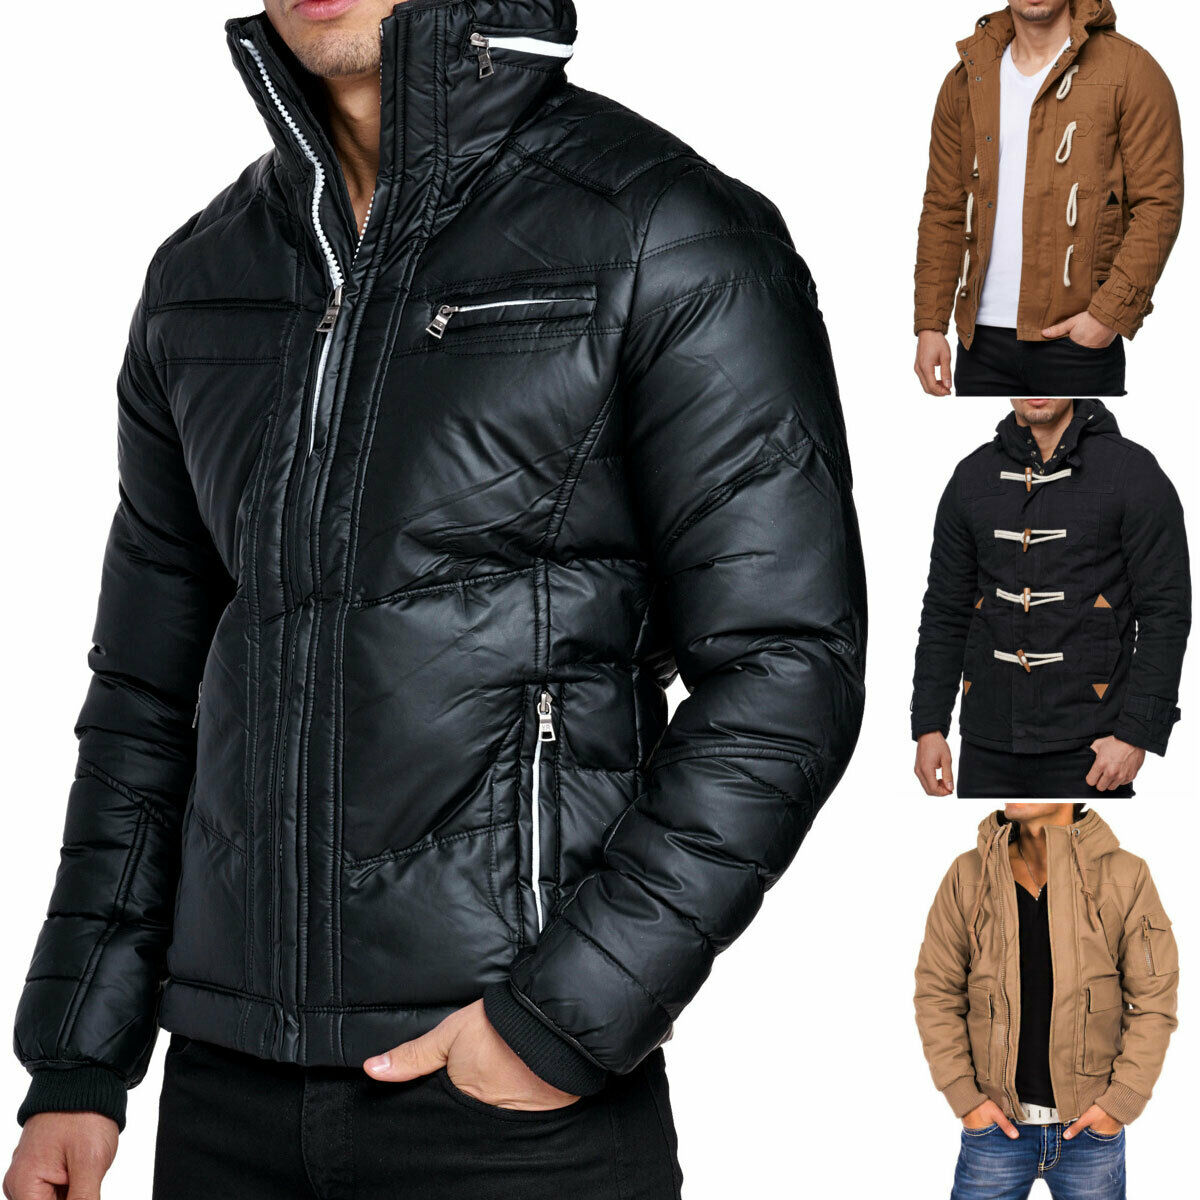 Young &  Rich Headline señores chaqueta invierno chaqueta Parka capucha forradas Bomber  barato en línea